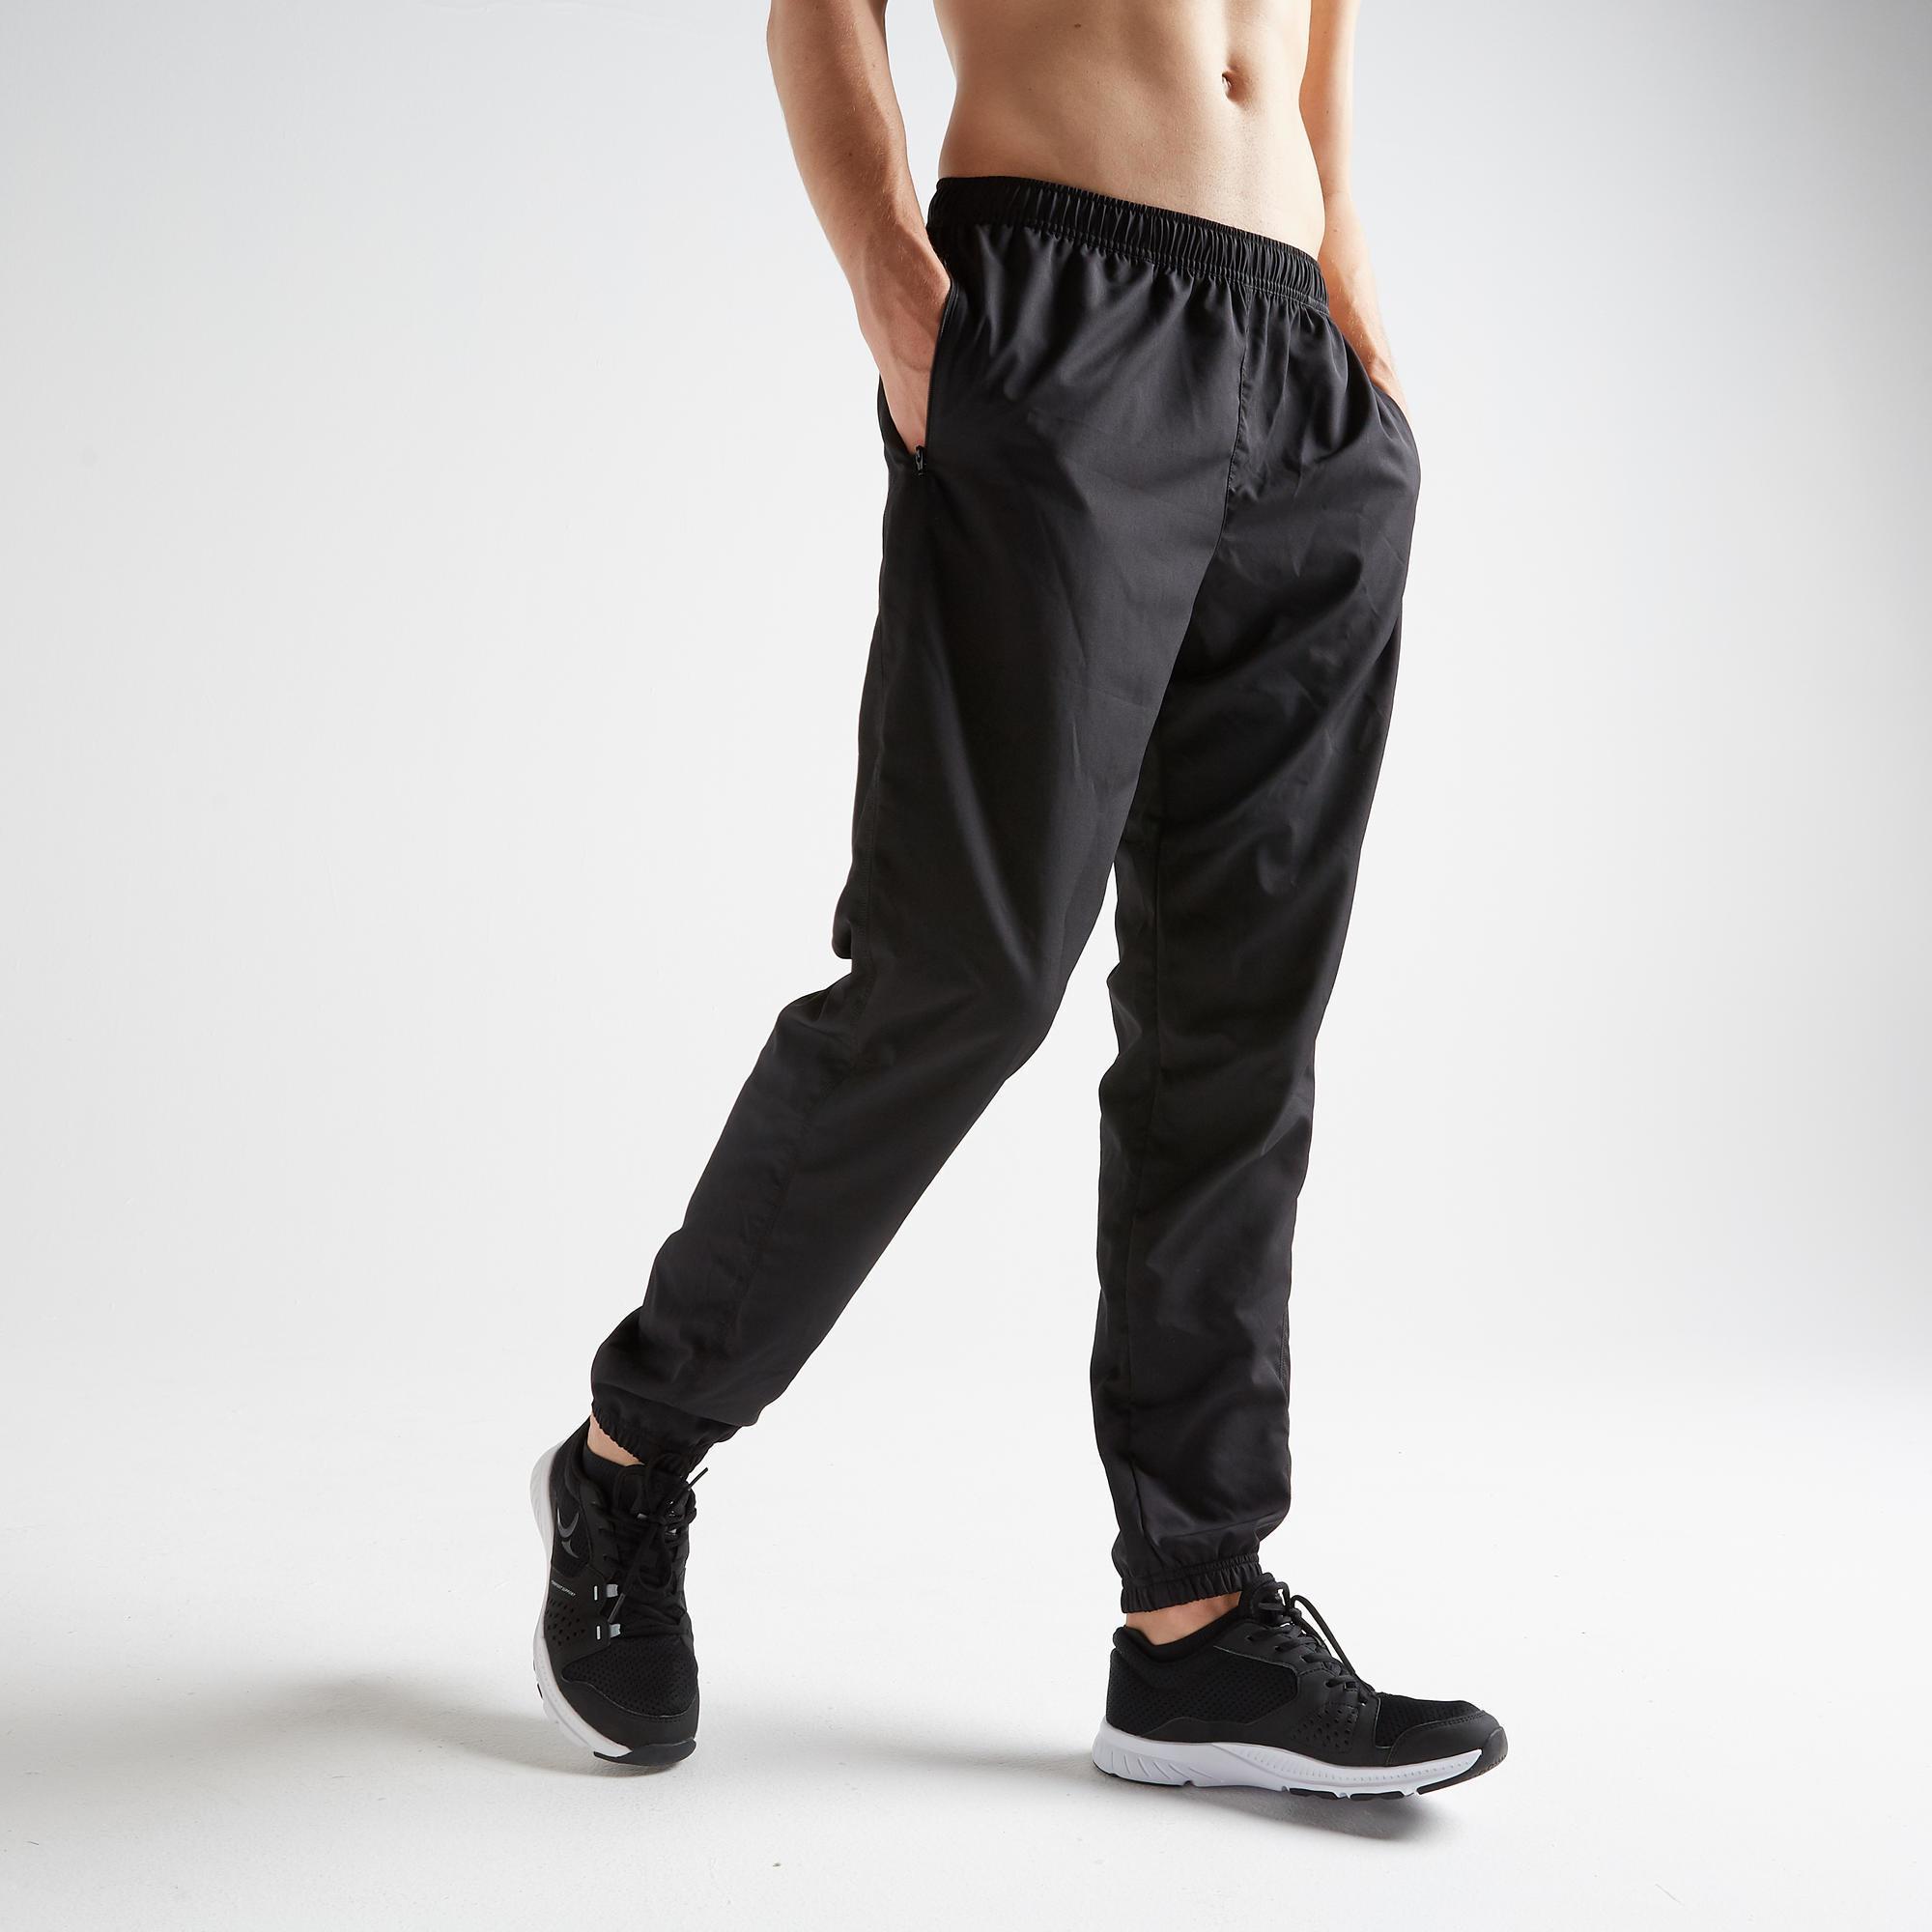 Pantalon Adidas Hombre Decathlon Cheap 08493 4b18d